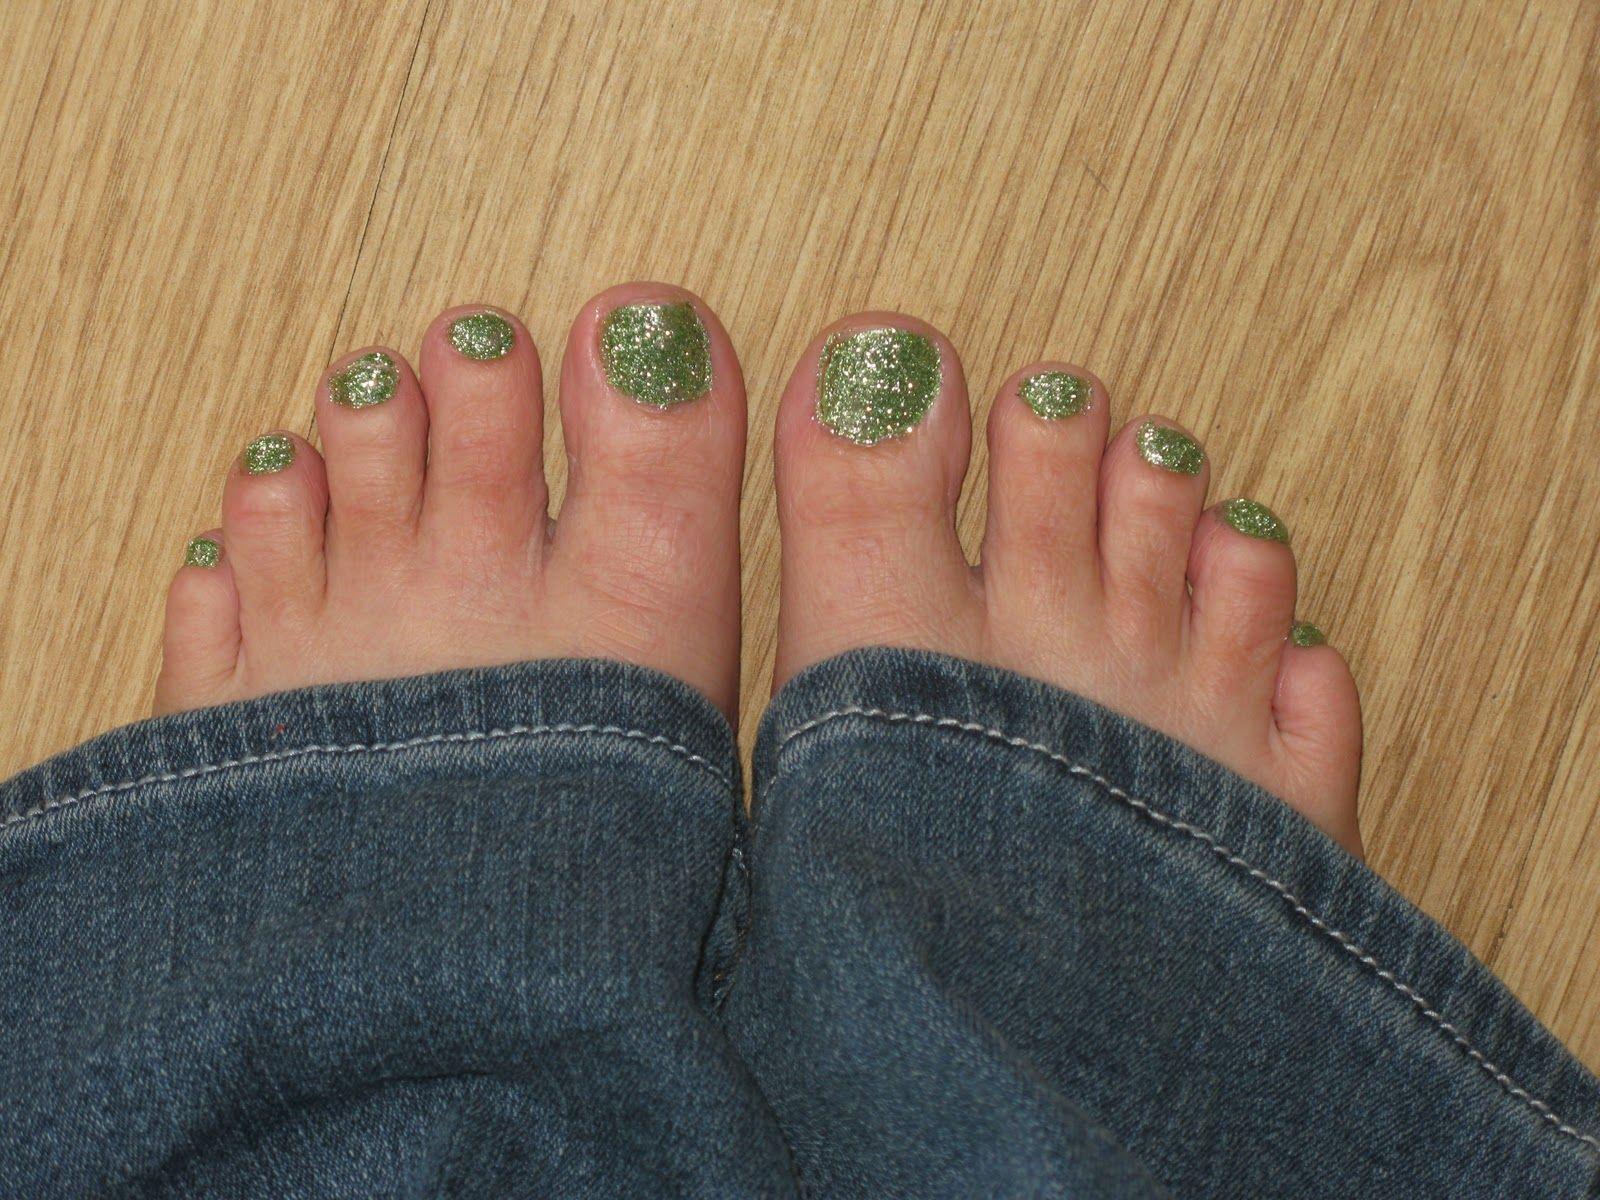 DIY Glitter Toes   Female Feet - Frauenfüße   Pinterest